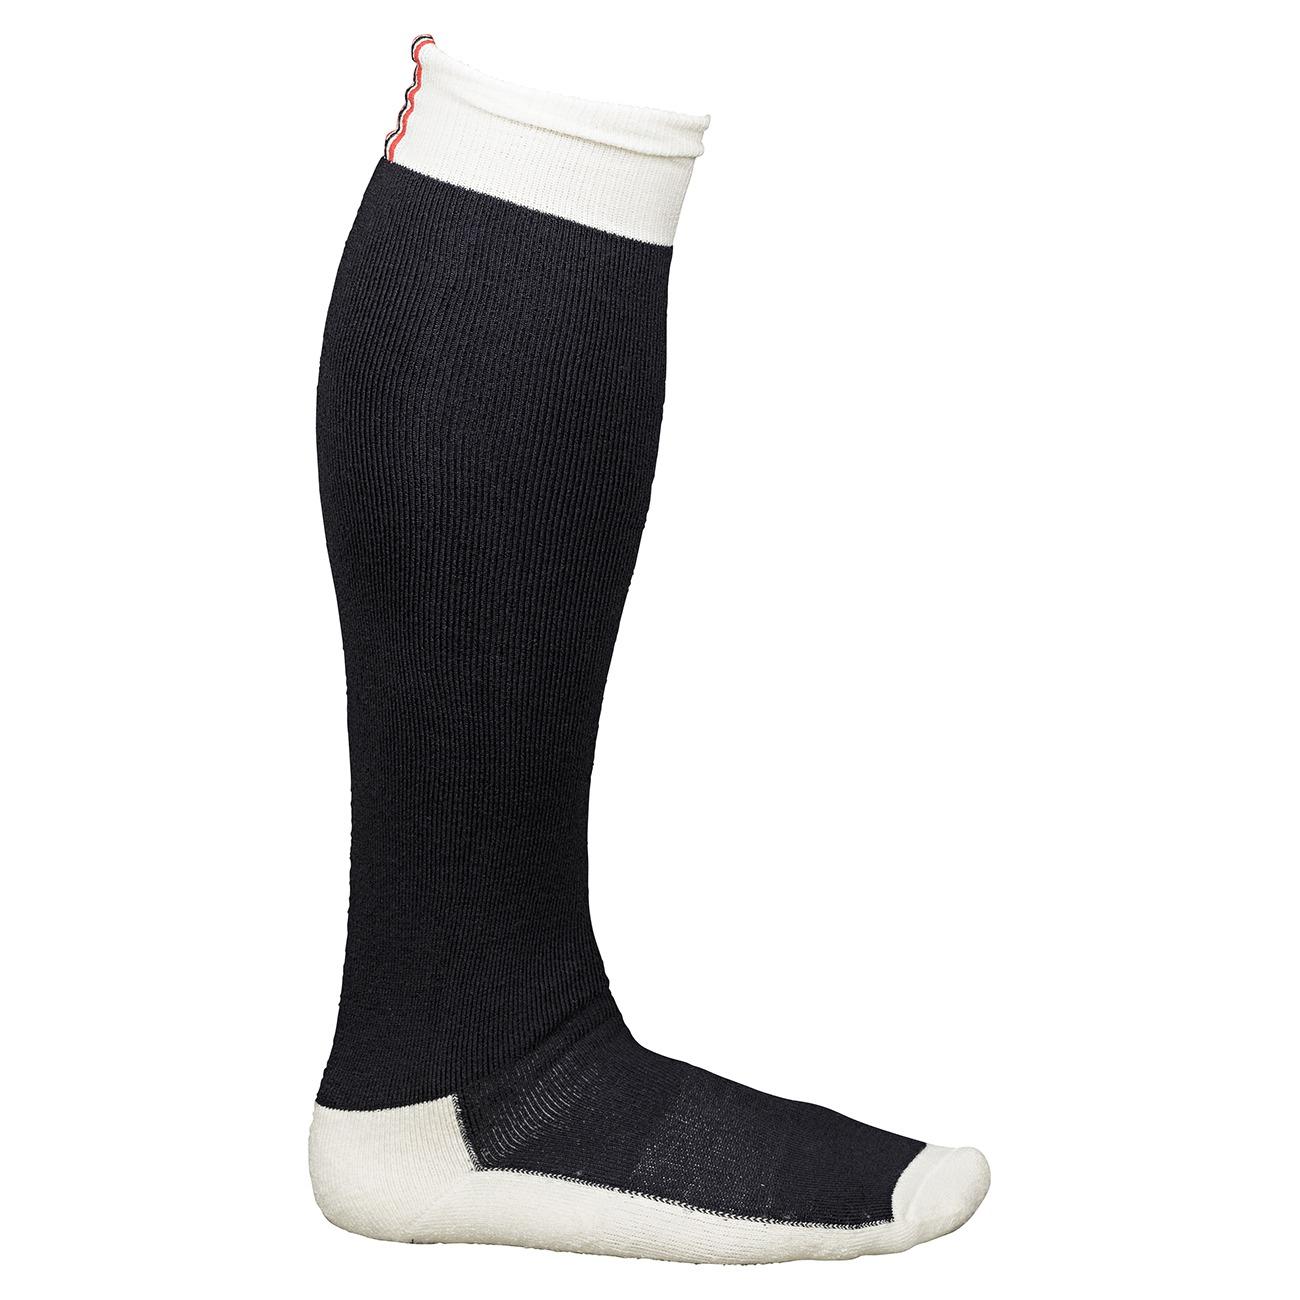 Amundsen Performance Socks